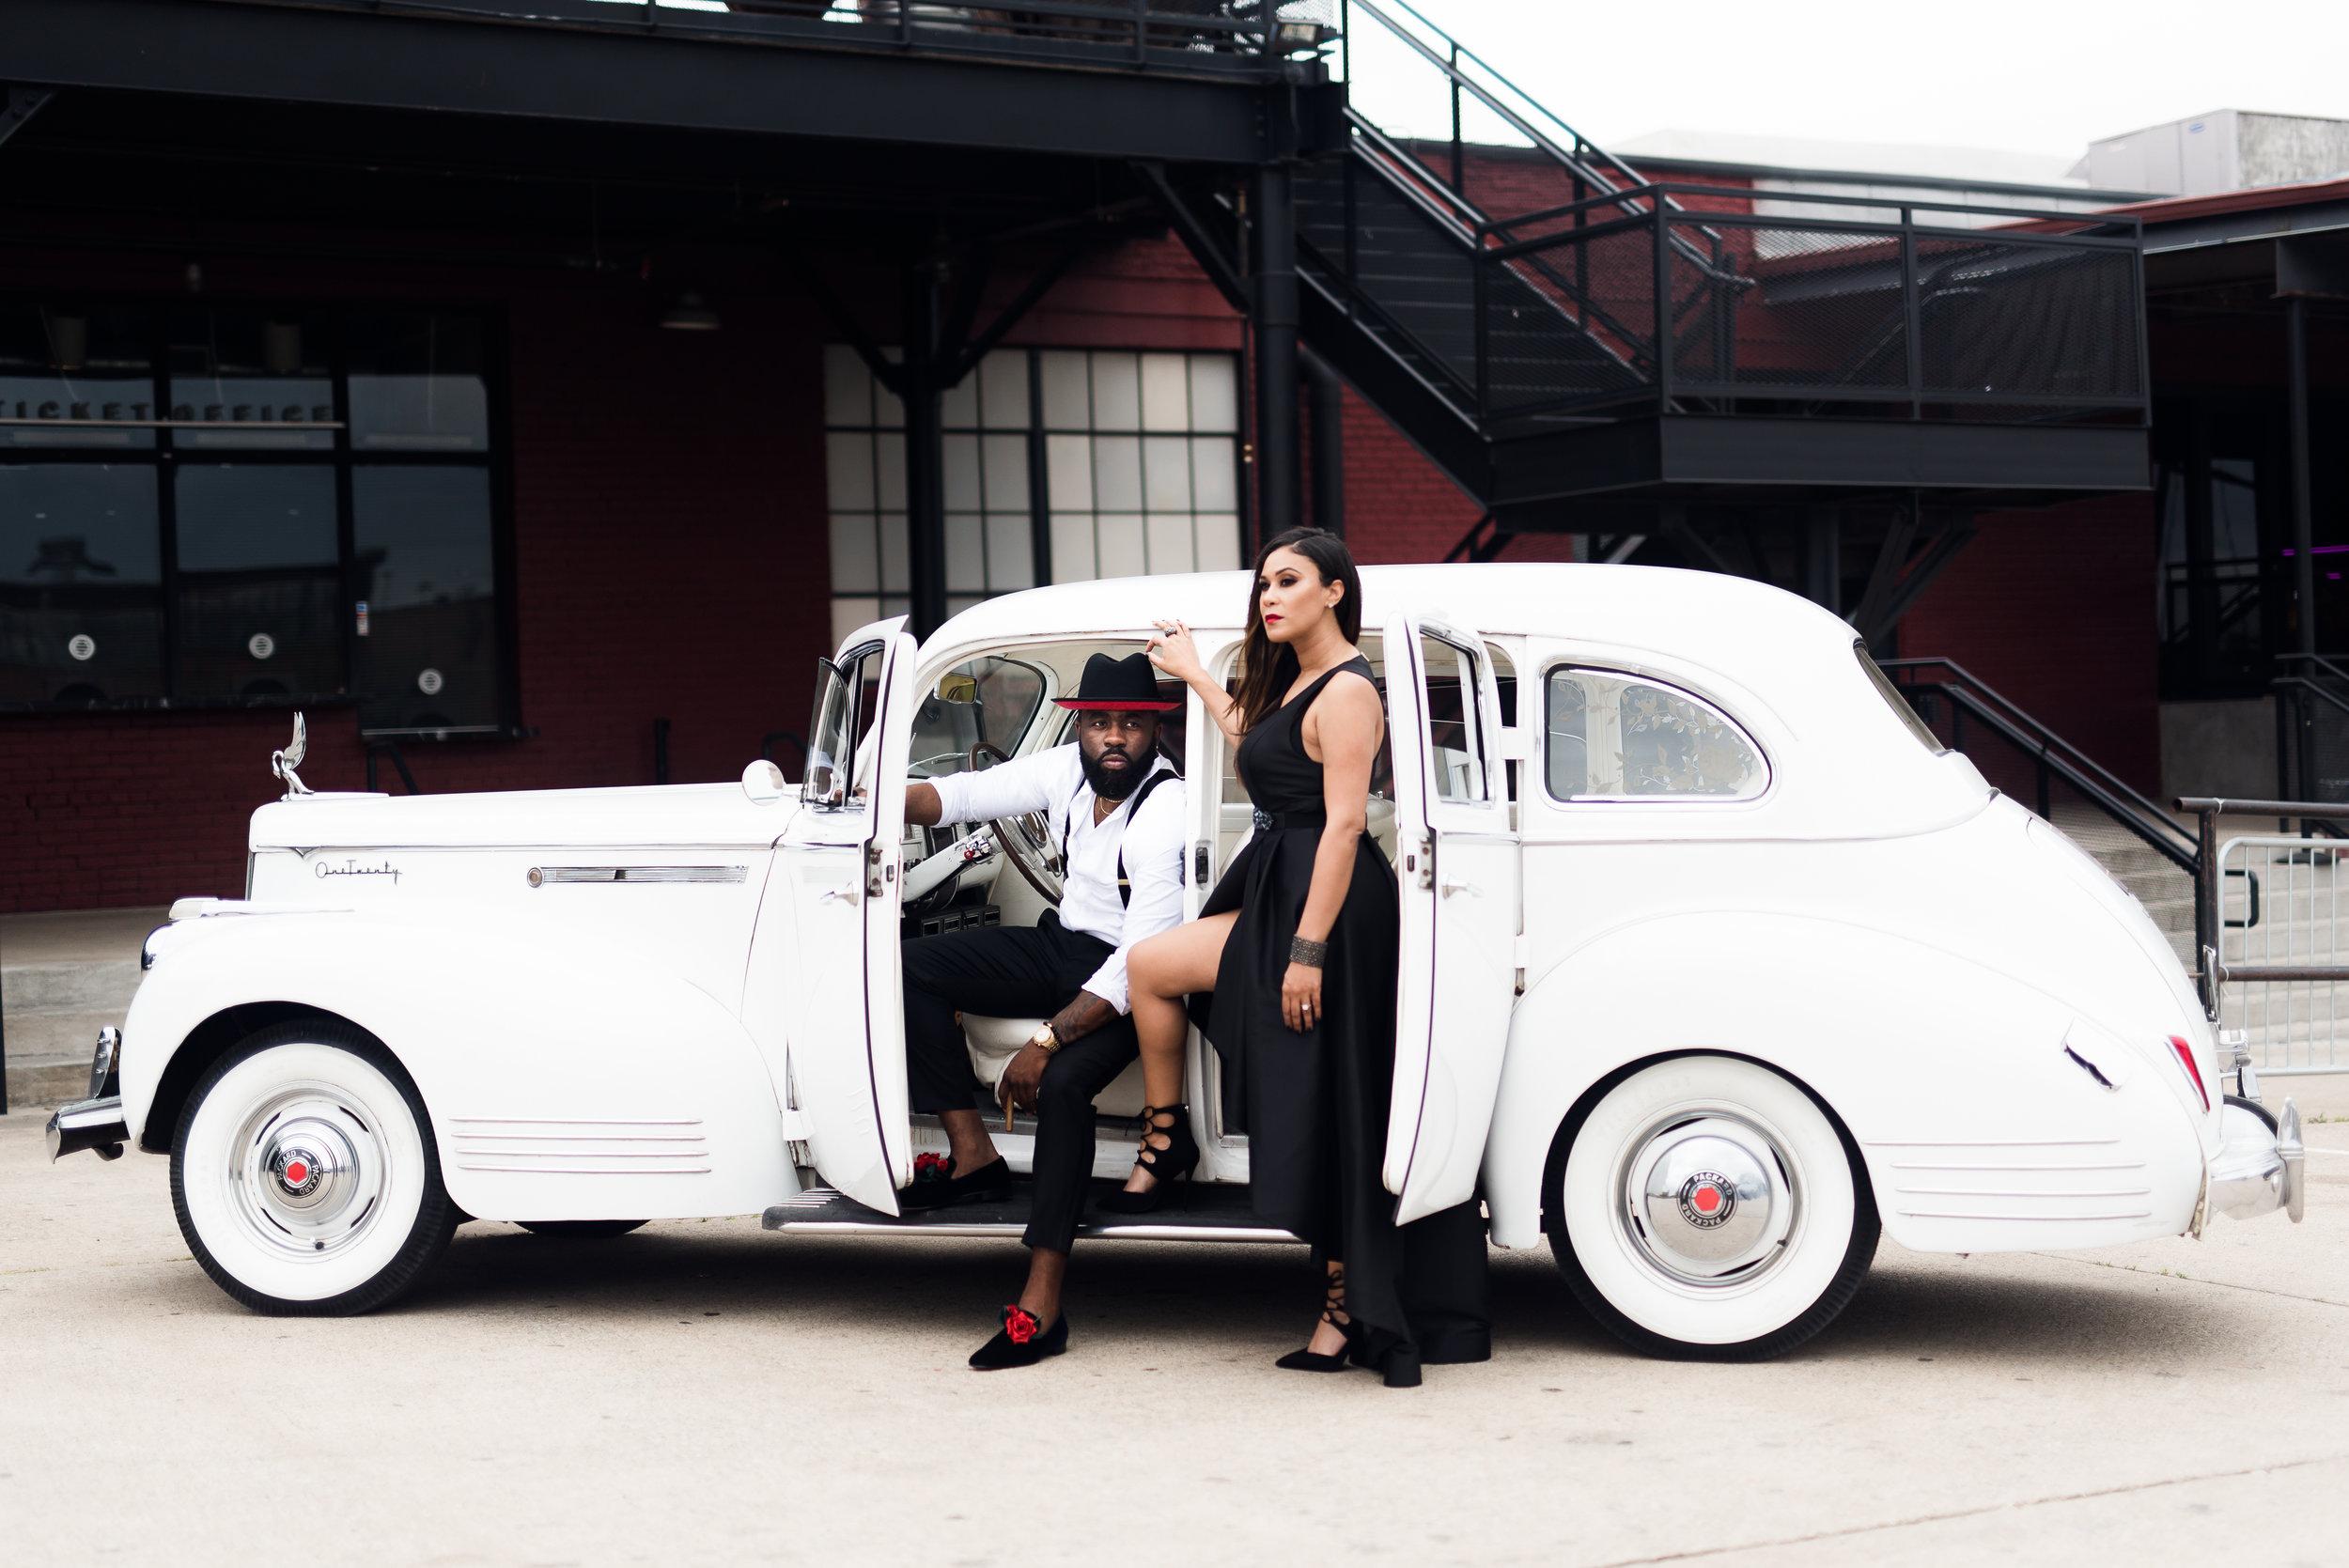 Pharris Photography- Engagement Session- Texa Photography- Dallas Engagement- Kerri and Bravion- NYLO Hotel- Vintage Car